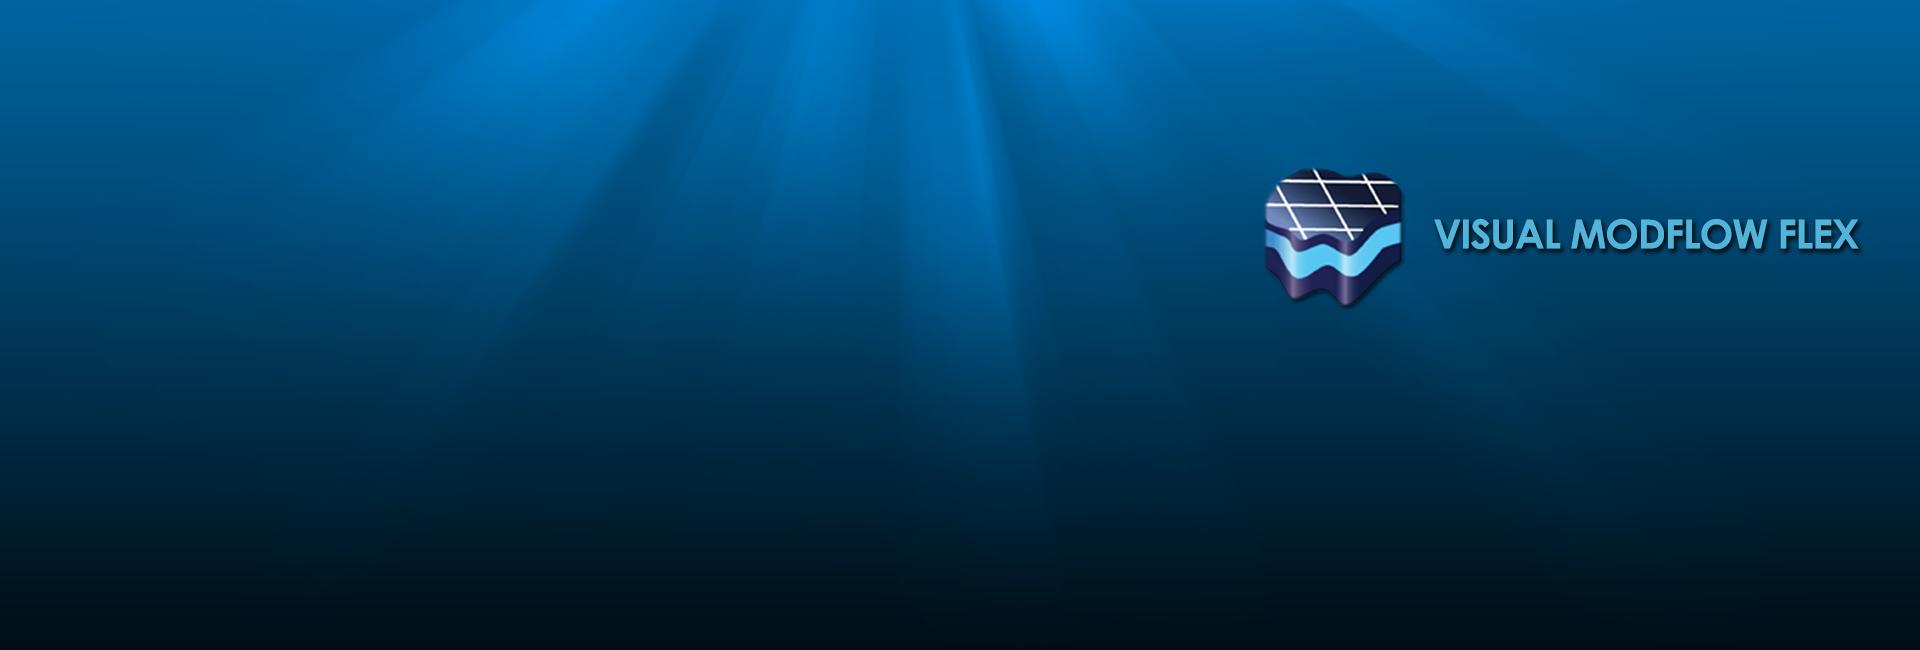 Oferta specjalna Visual MODFLOW